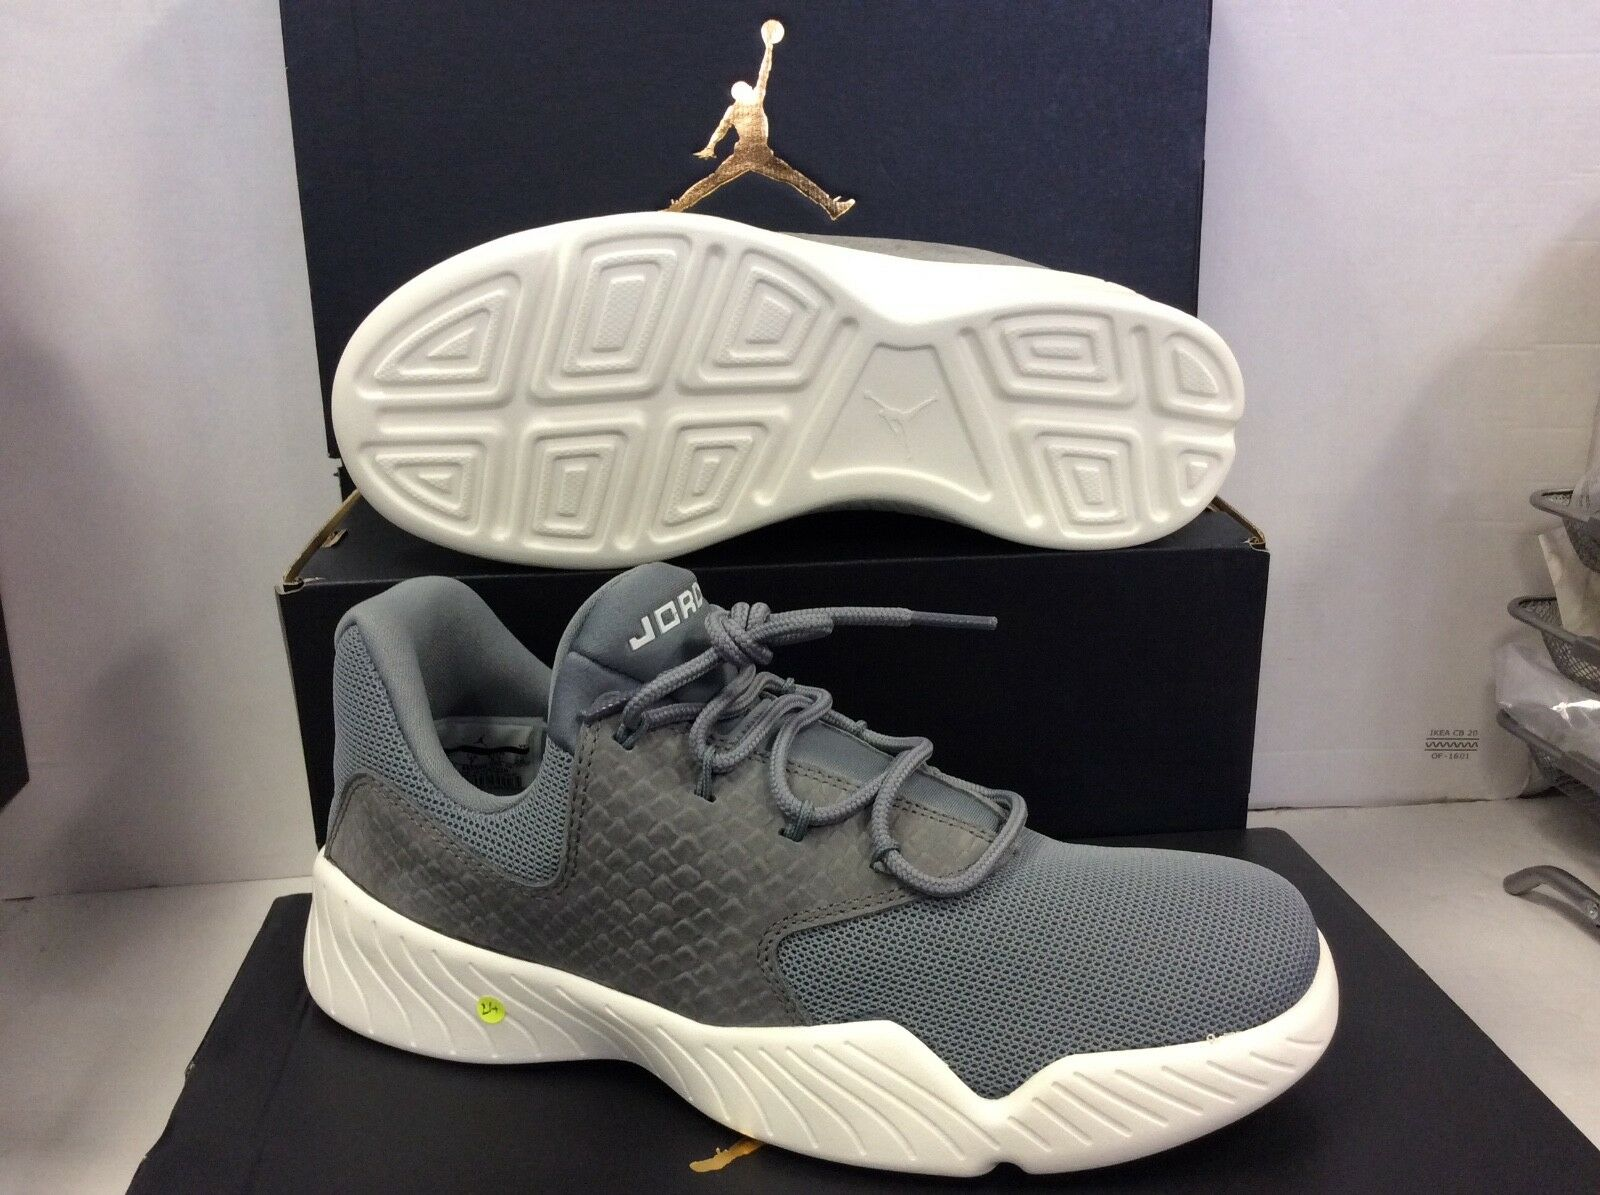 Nike JORDAN J23 faible homme Trainers,